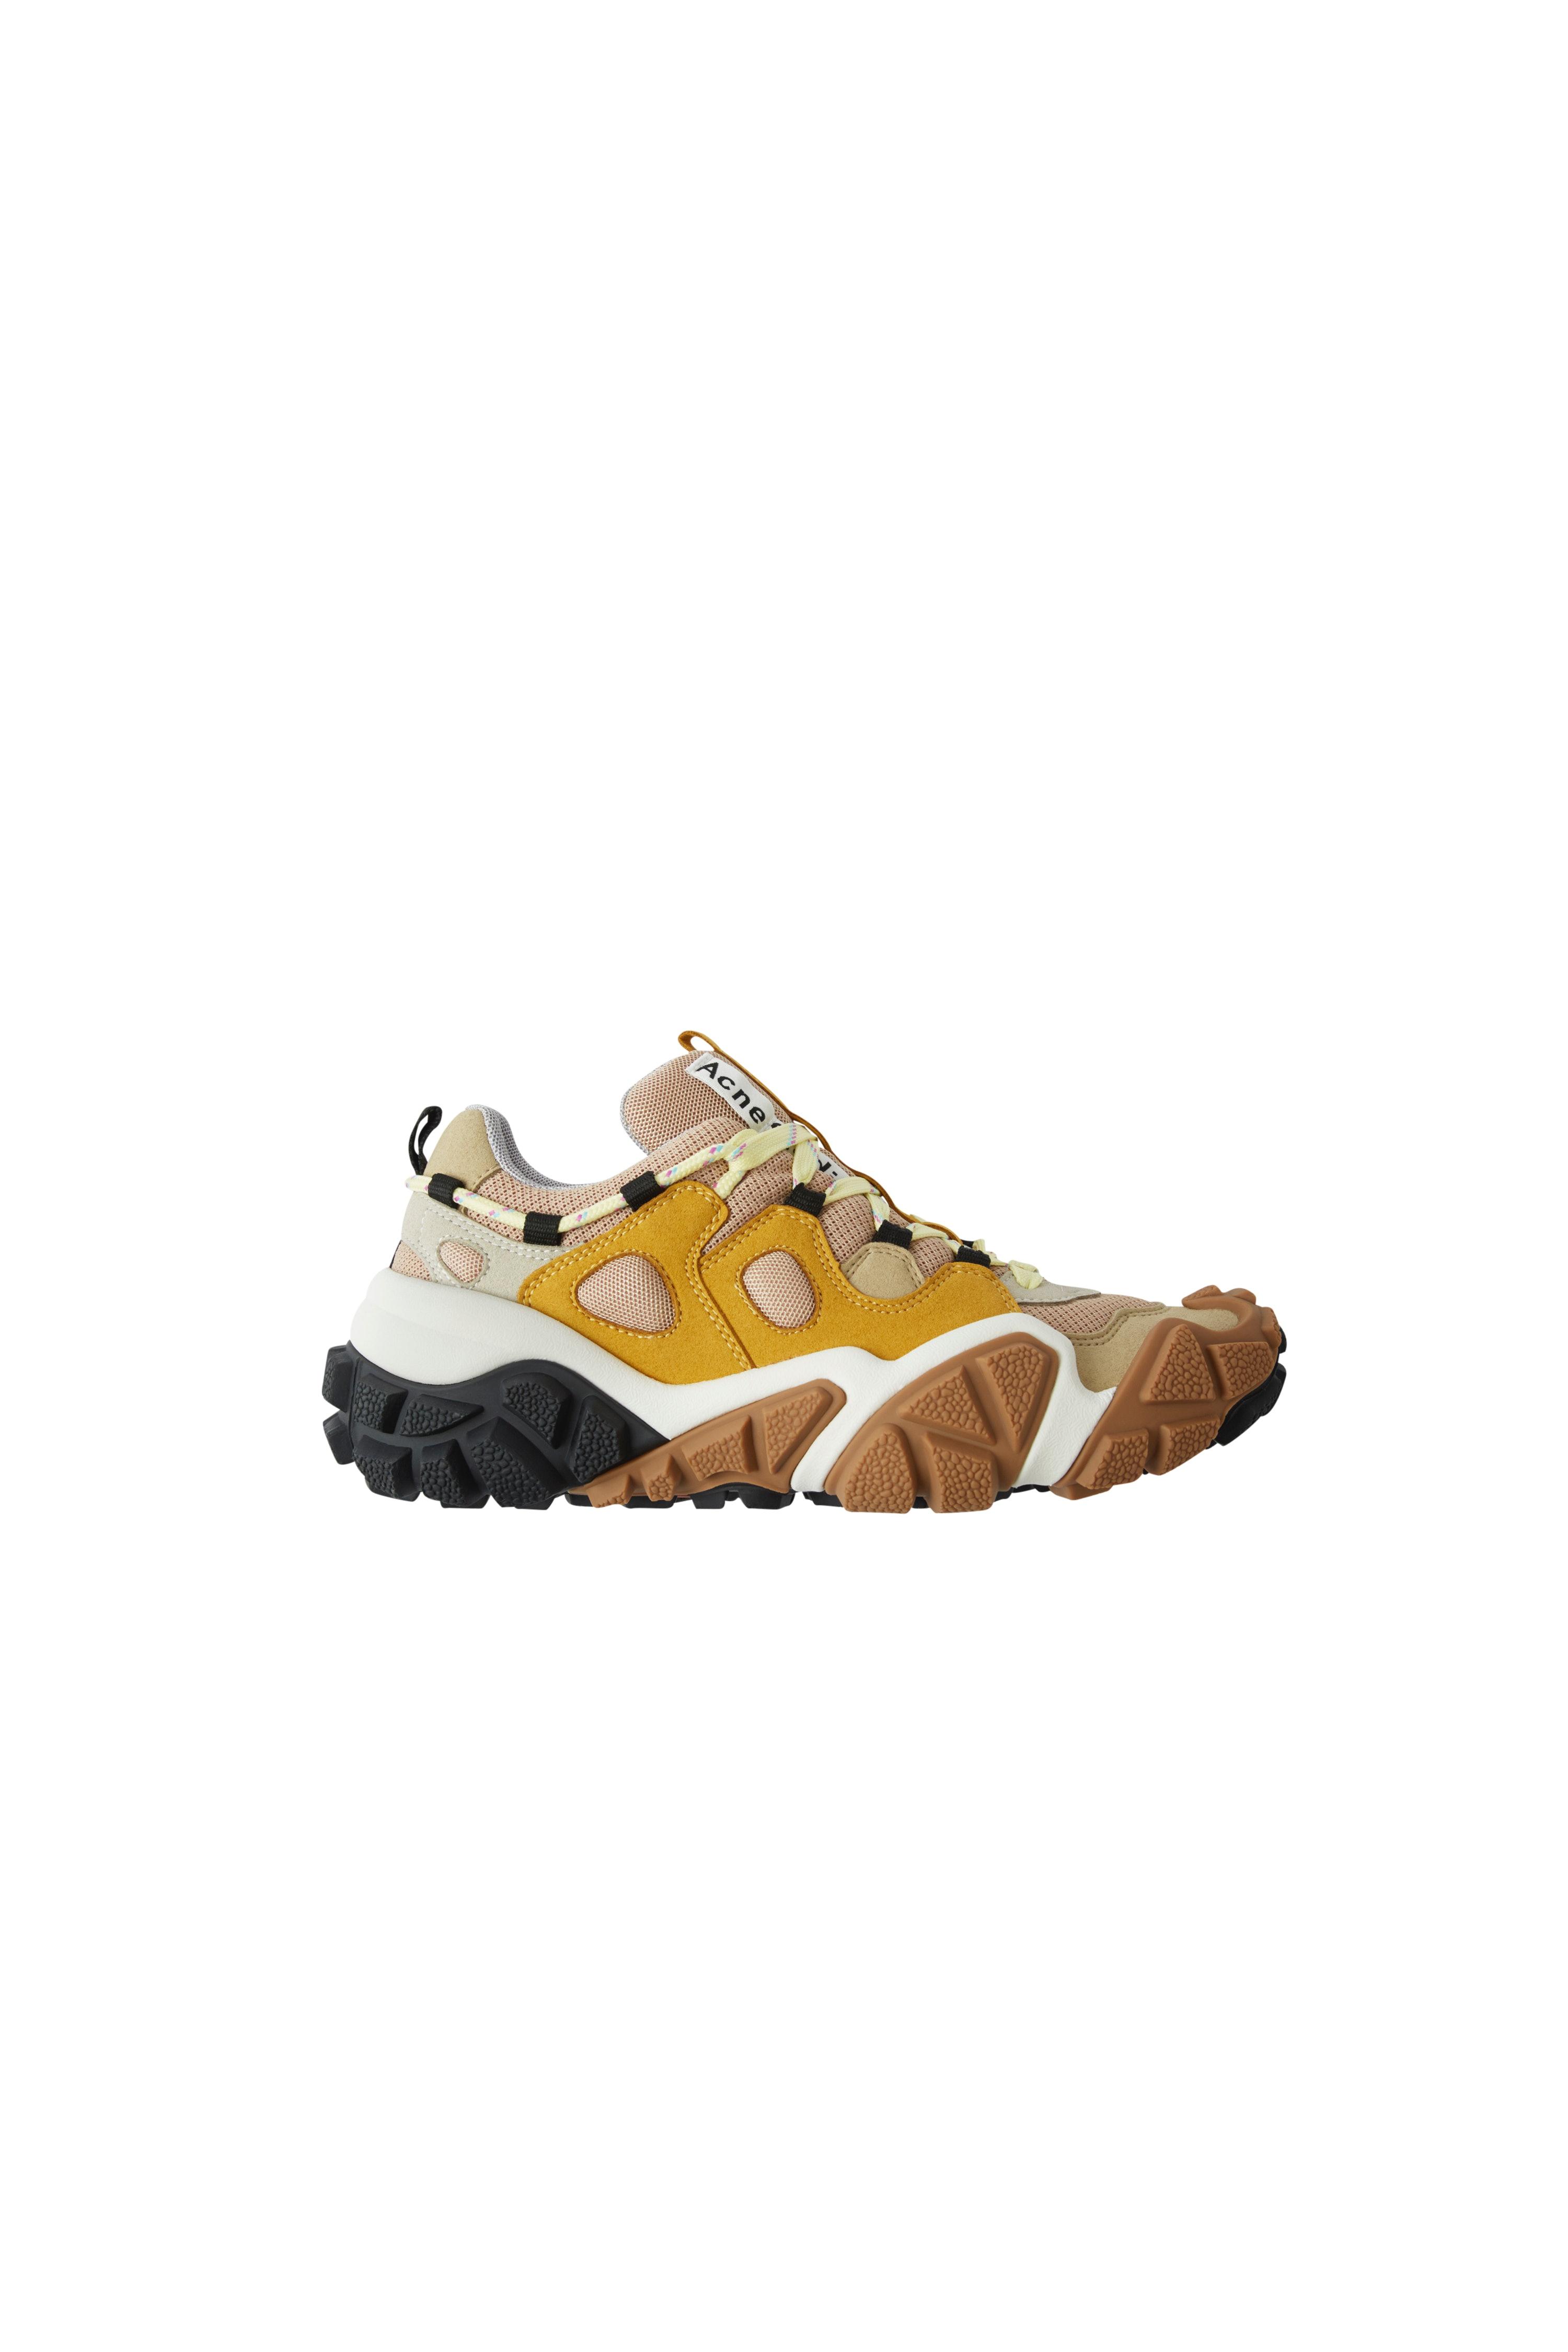 Acne Studios' Bolzter Sneaker Is